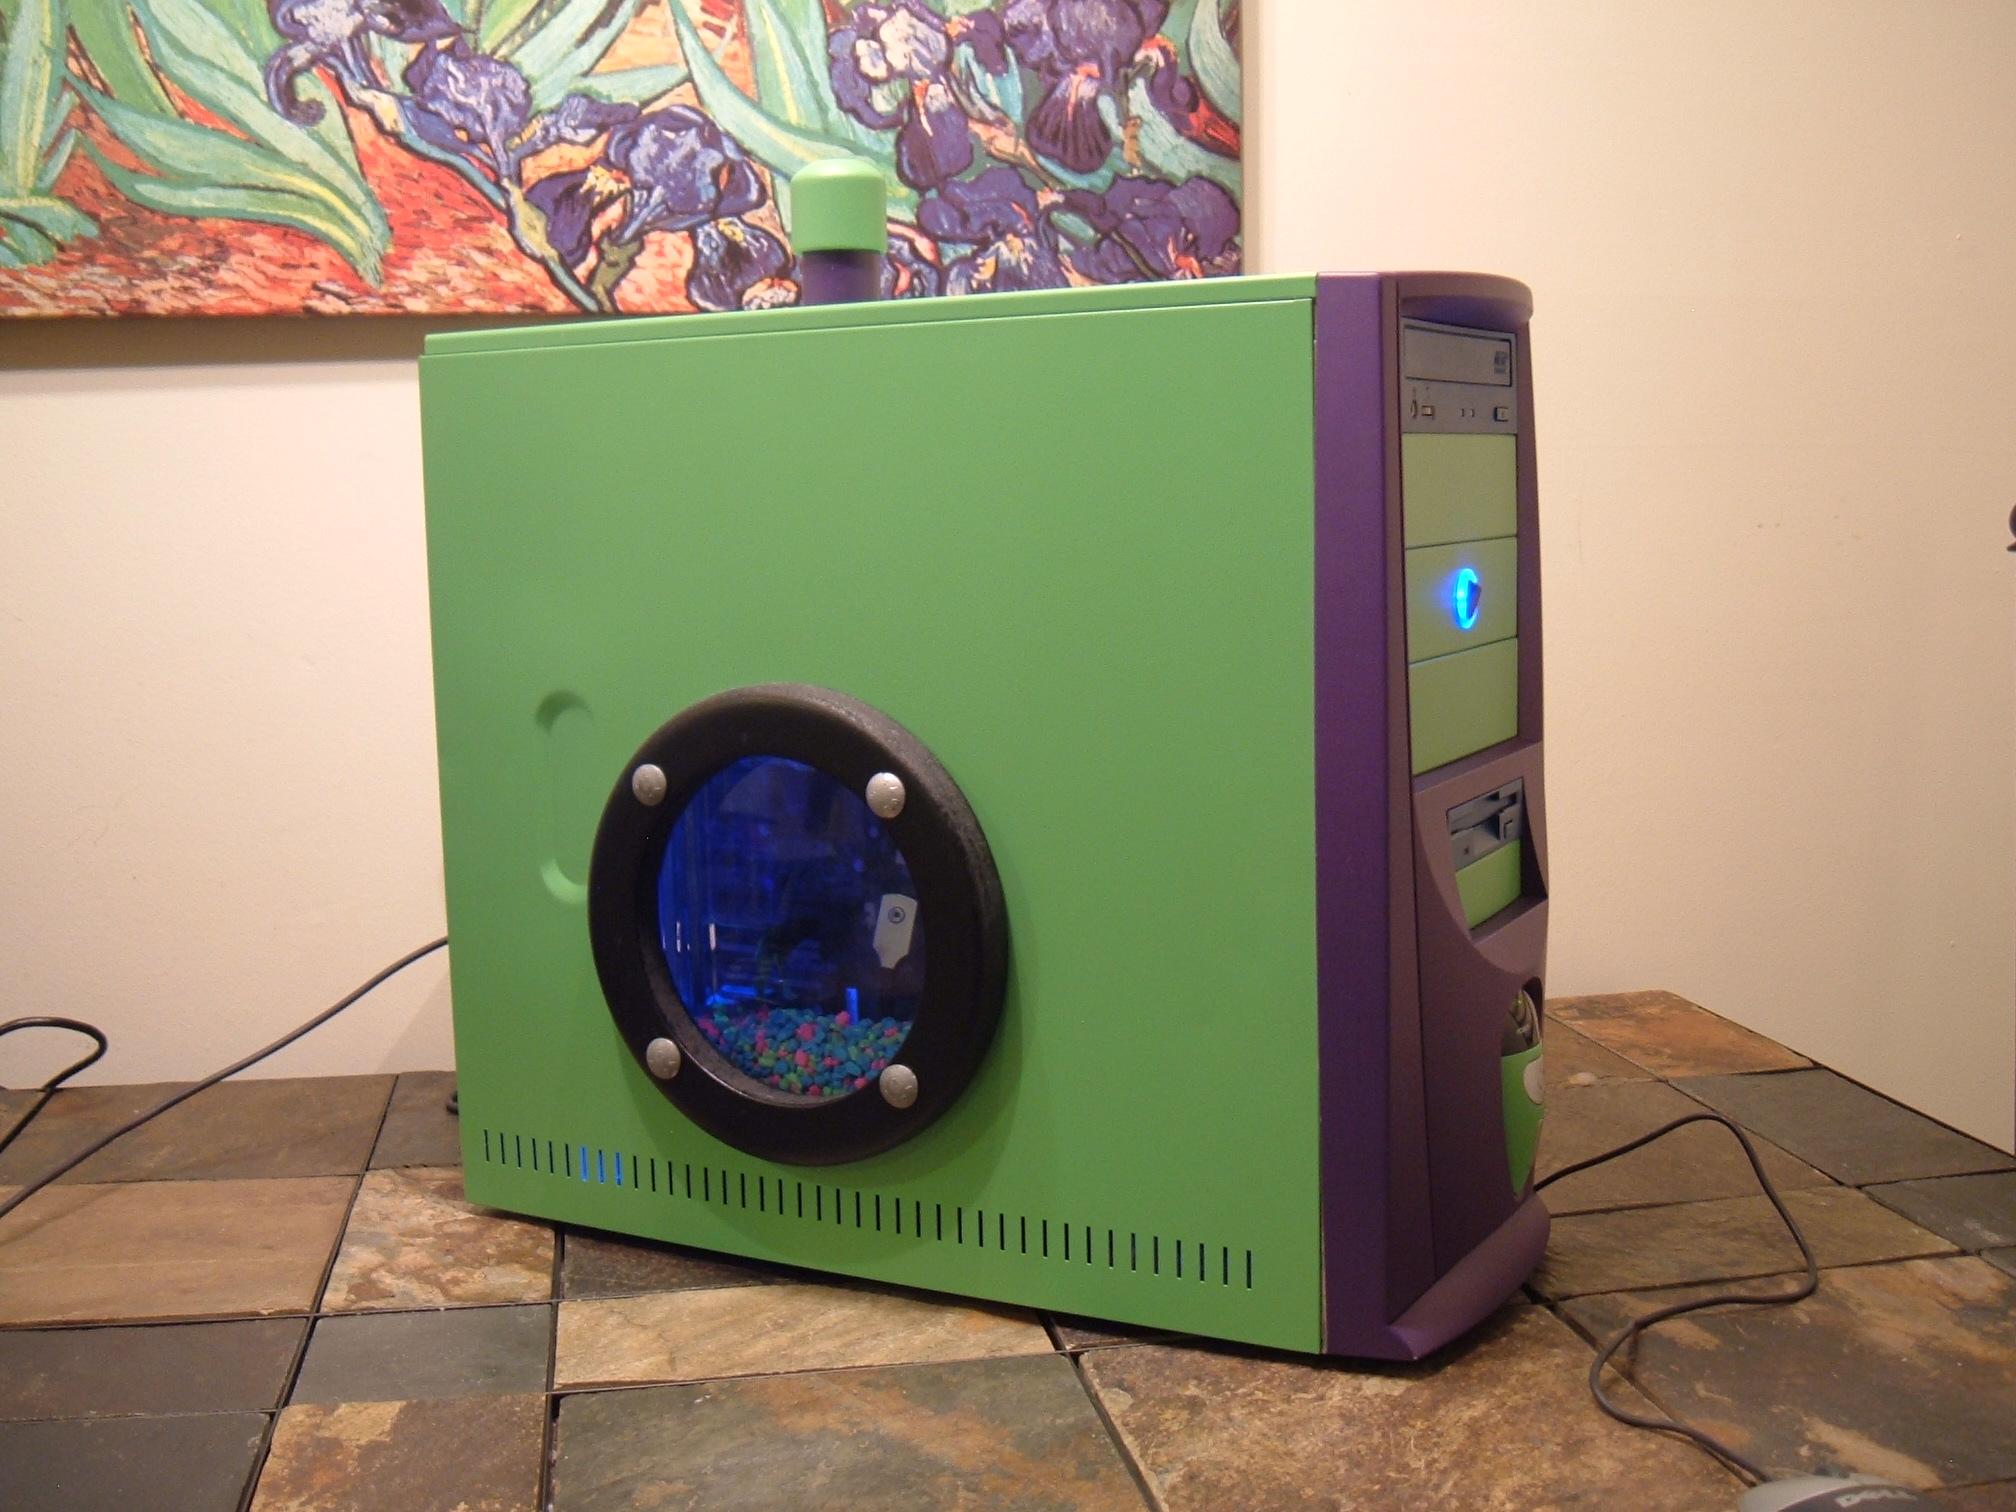 """Turn your Dead PC into an Aquarium"""